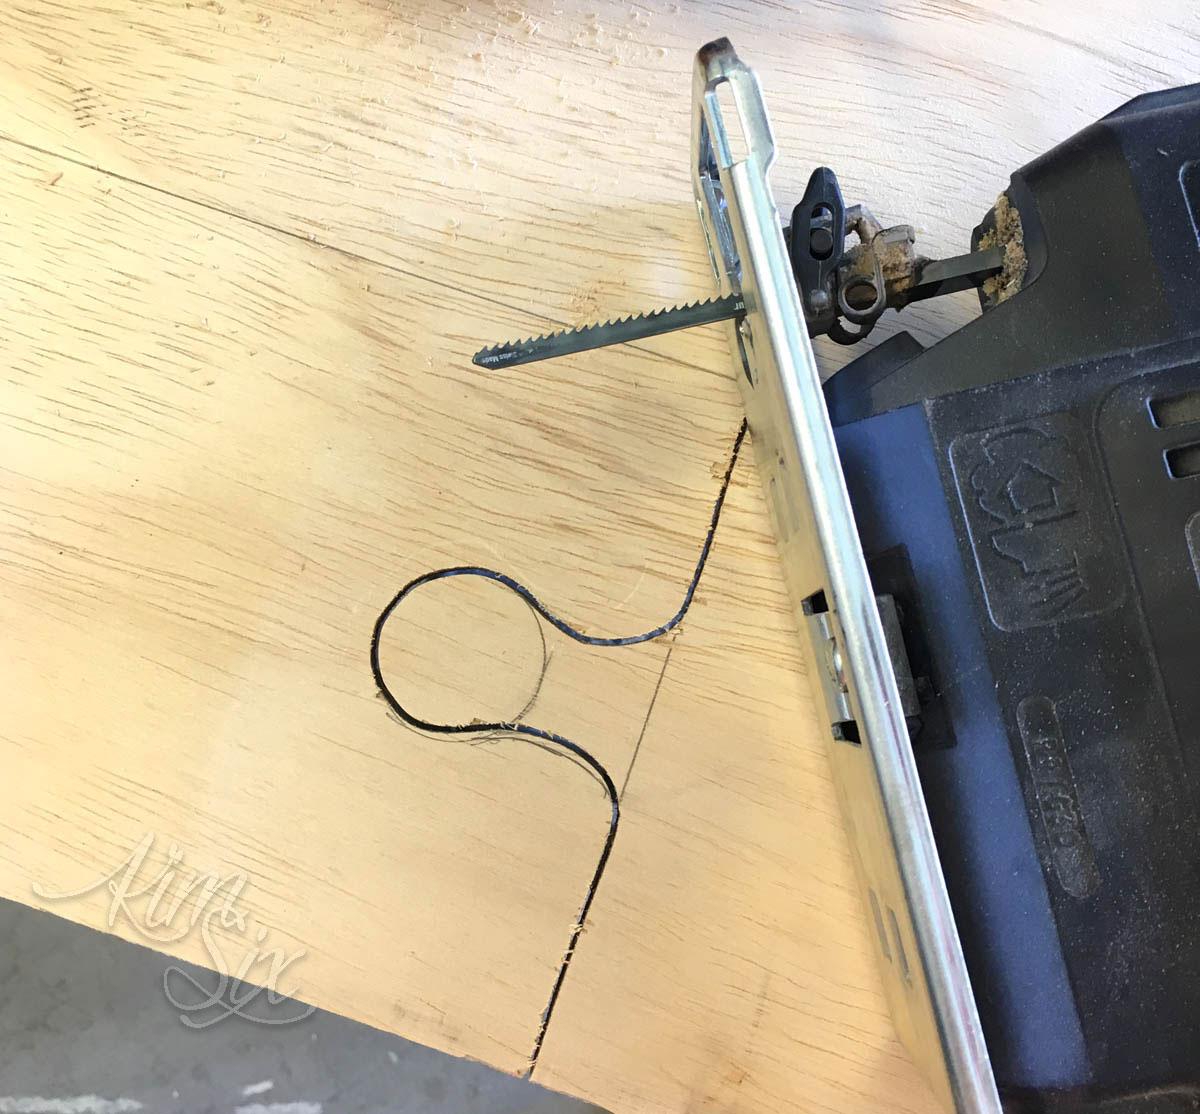 Cutting with scroll saw